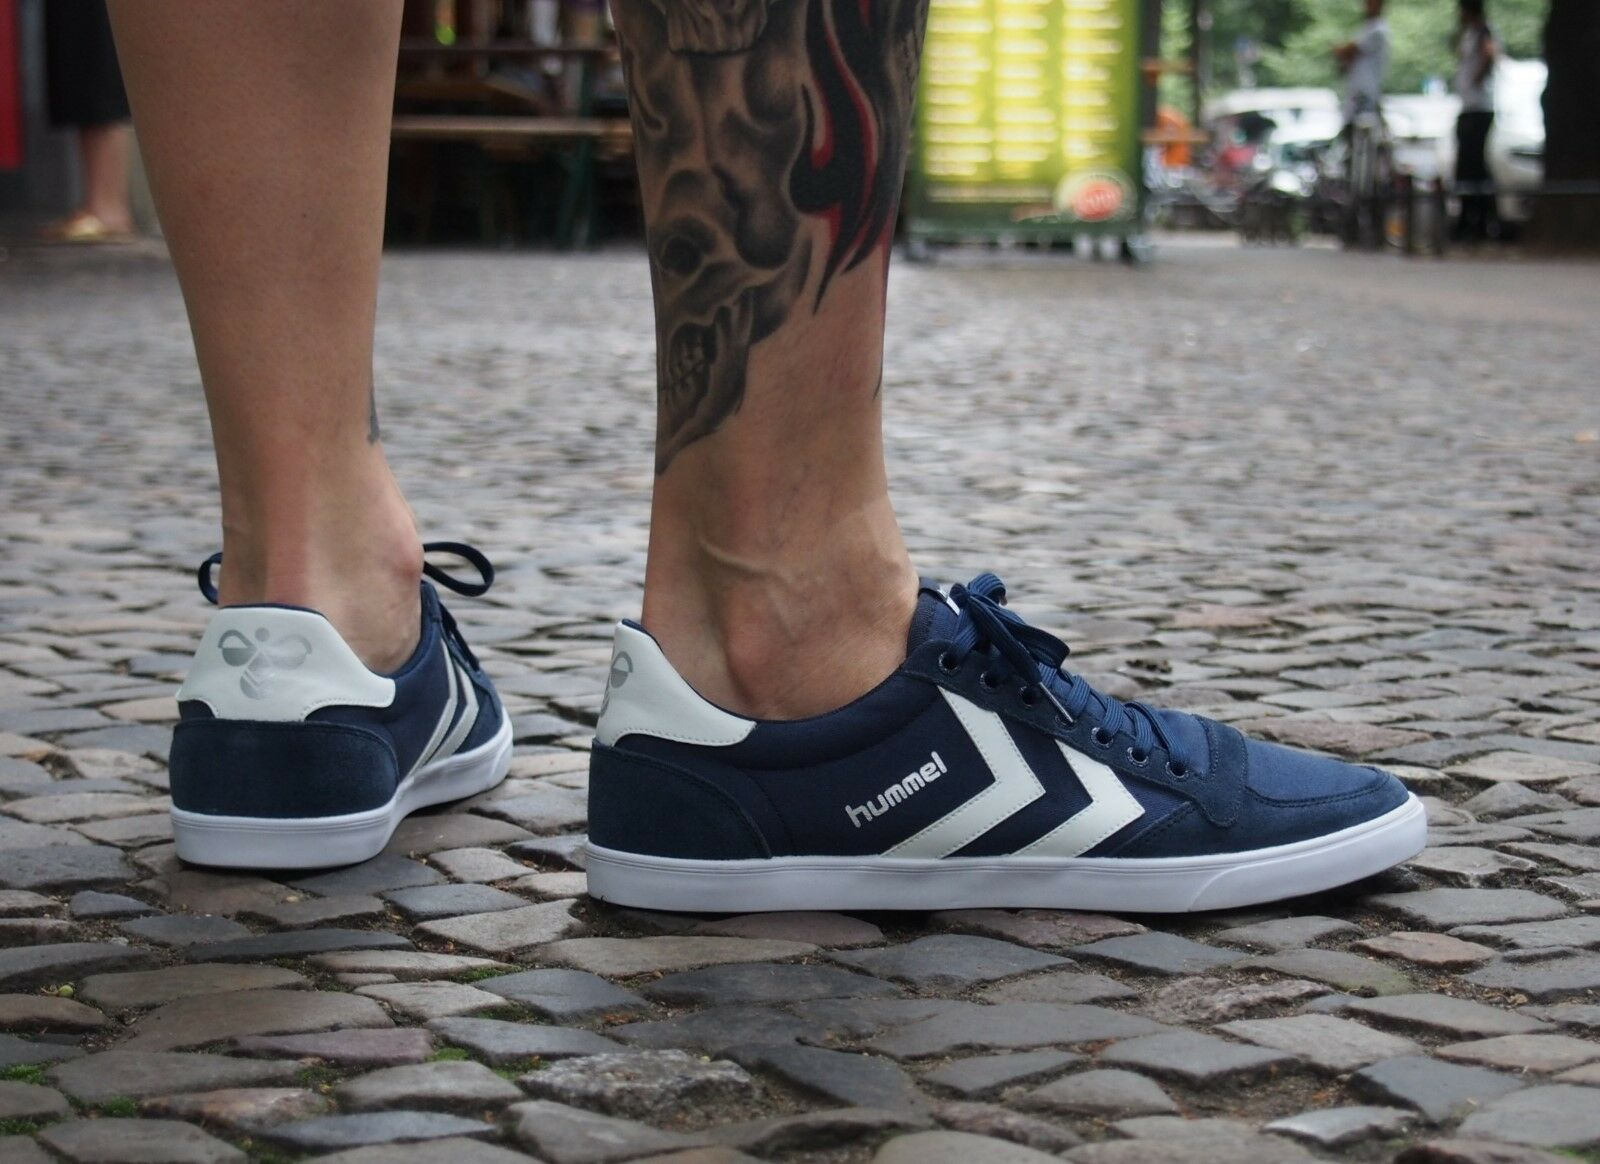 Hummel Sports Schuhe Schuhe Schuhe SLIMMER STADIL LOW 63-512-7647 dress Blau Canvas blau NEU  e1647a